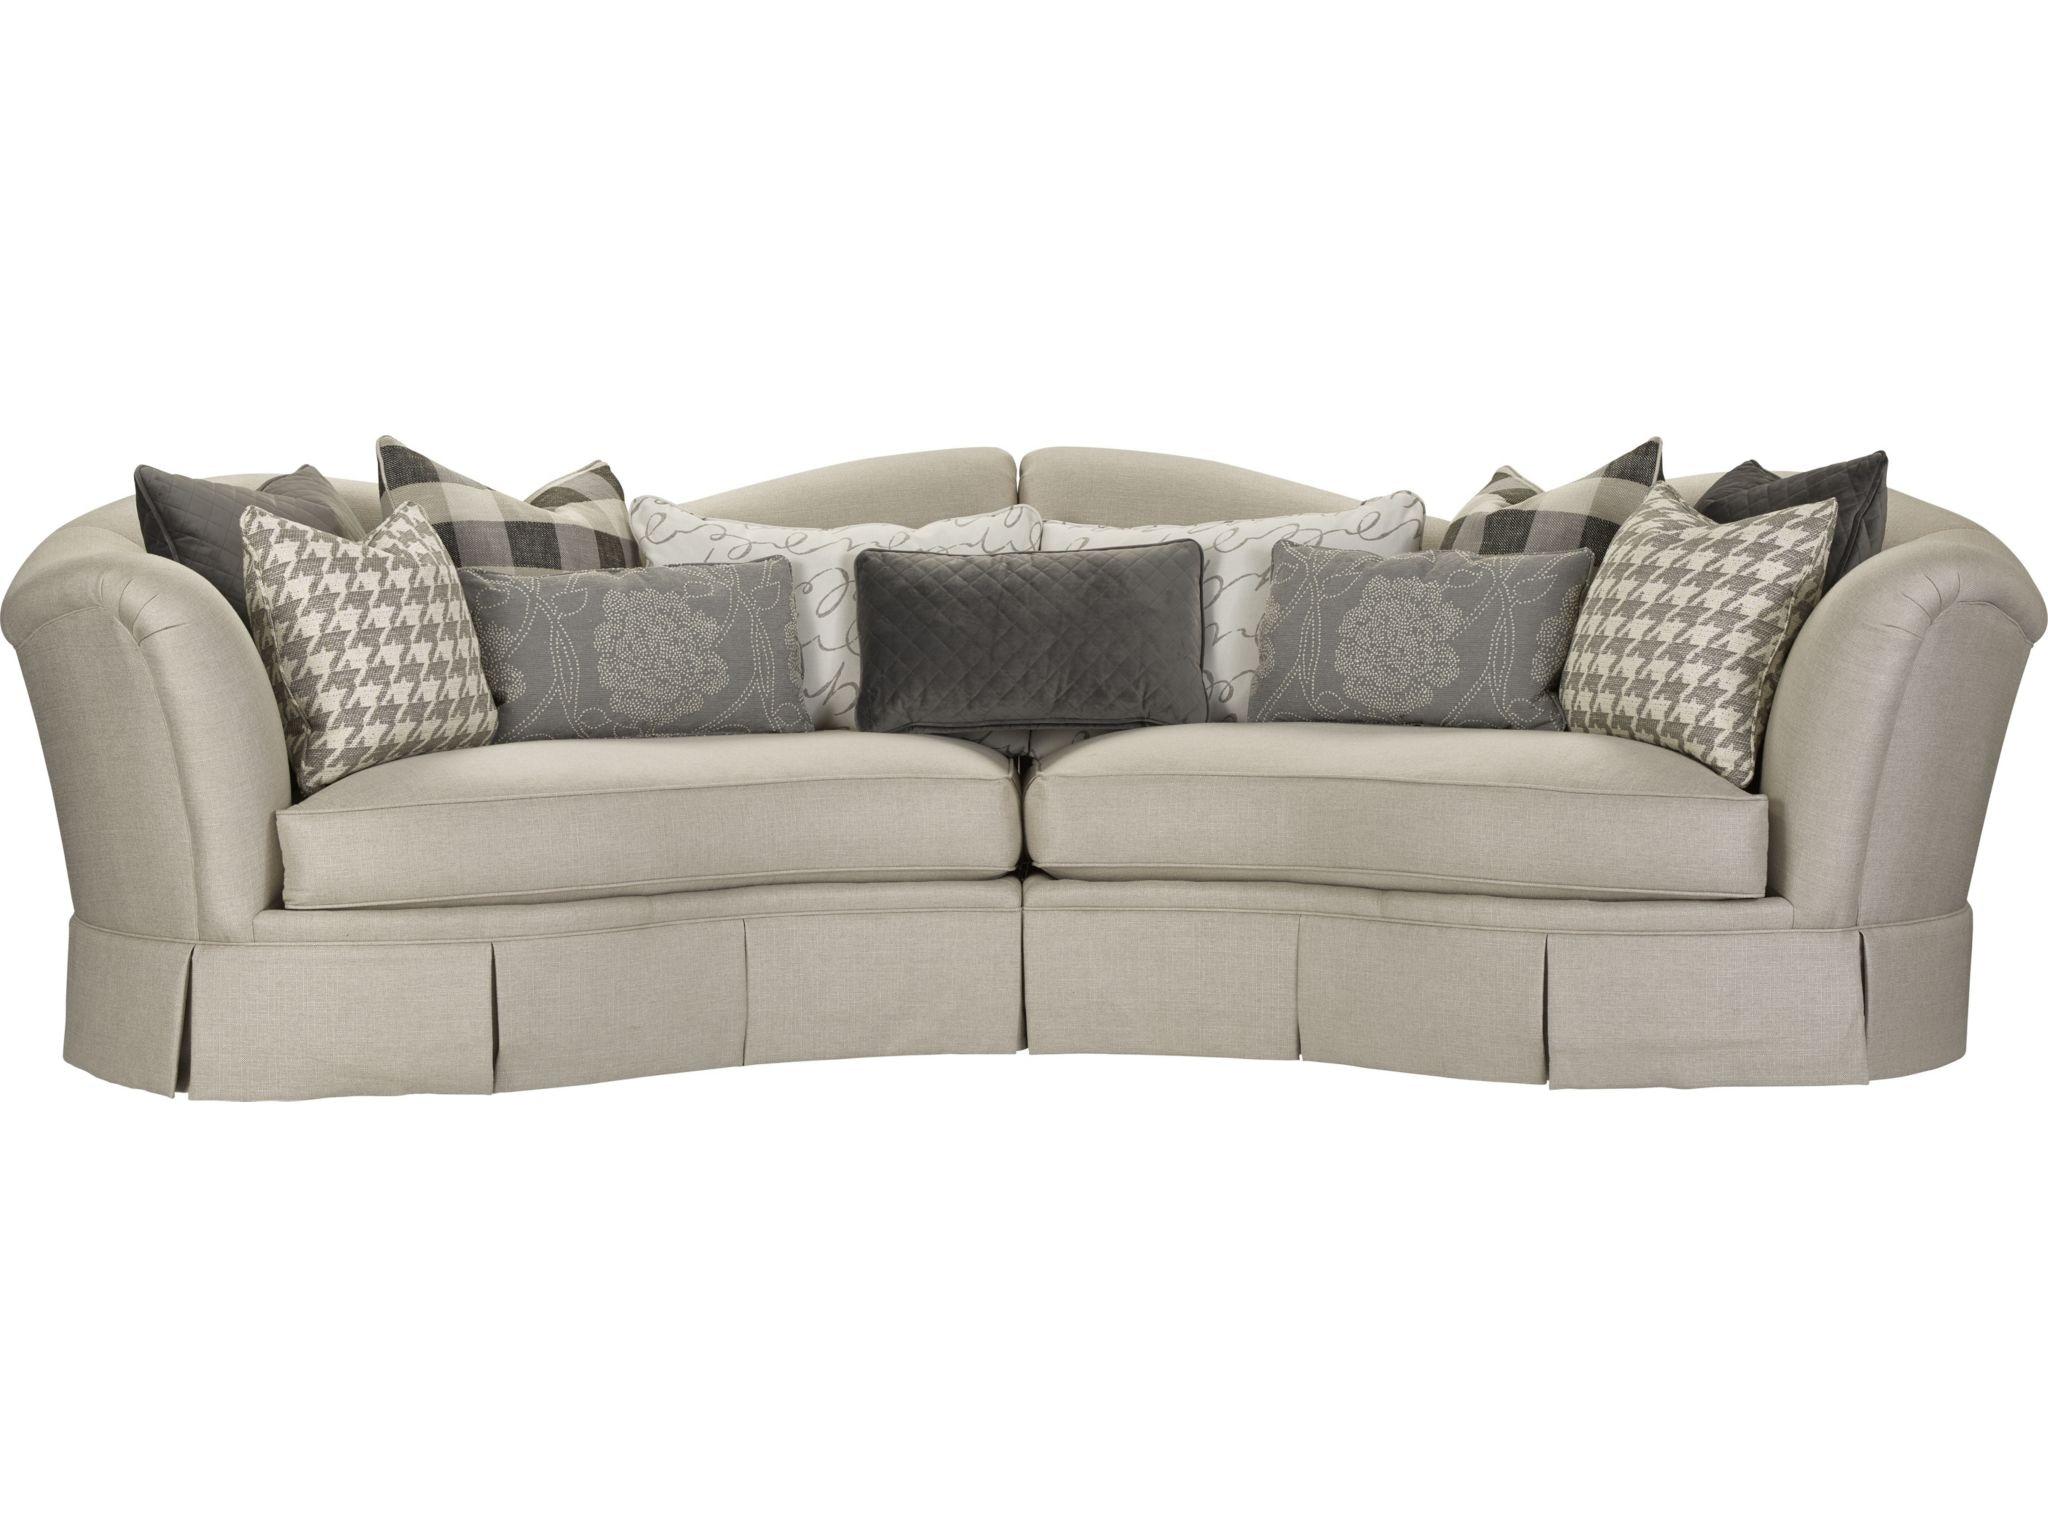 thomasville reclining sofa small sleeper sectional living room san lorenzo 1471 sect